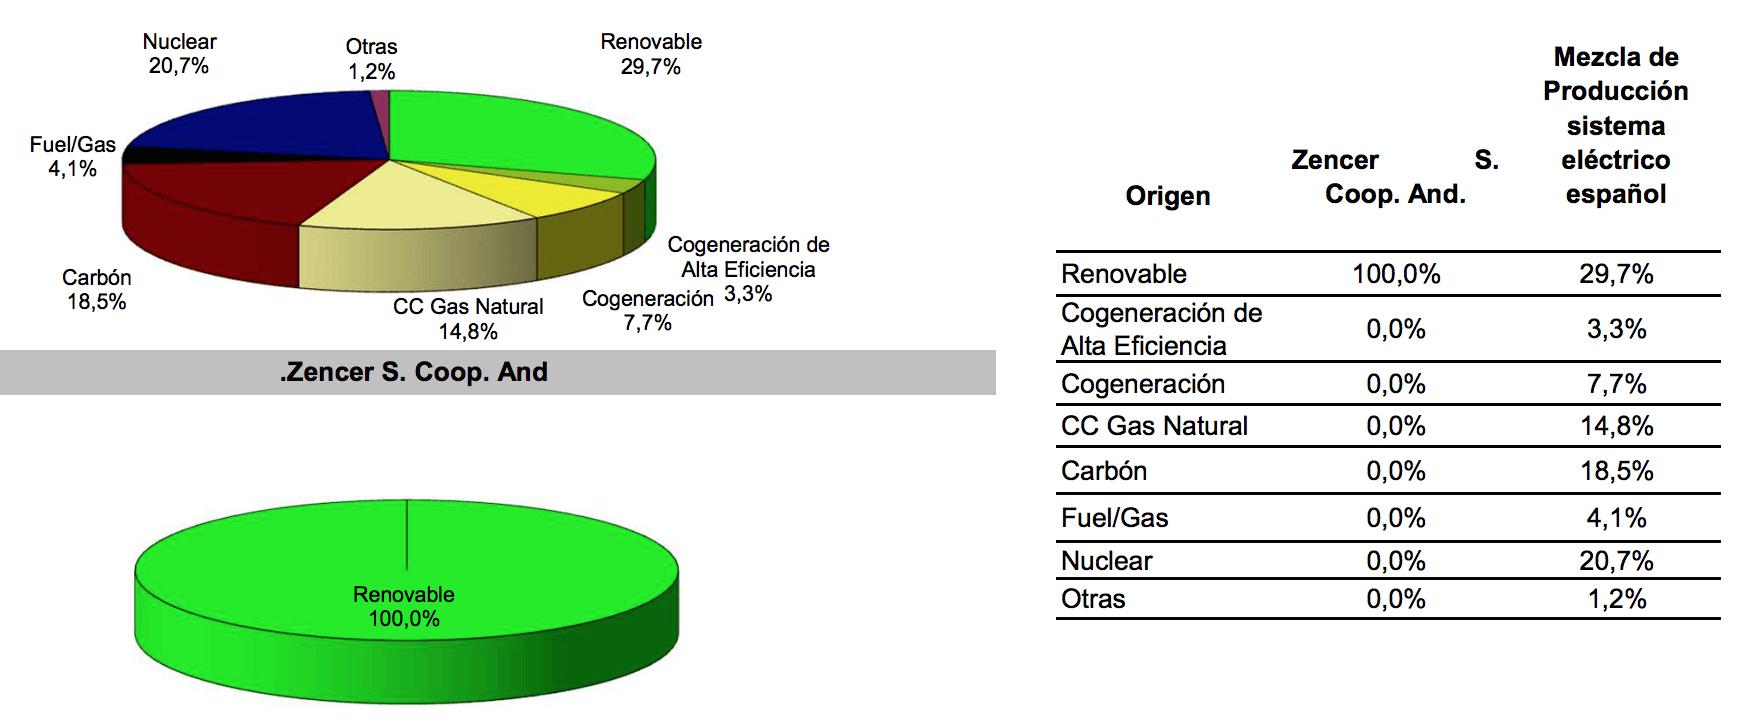 origen electricidad renovable zencer